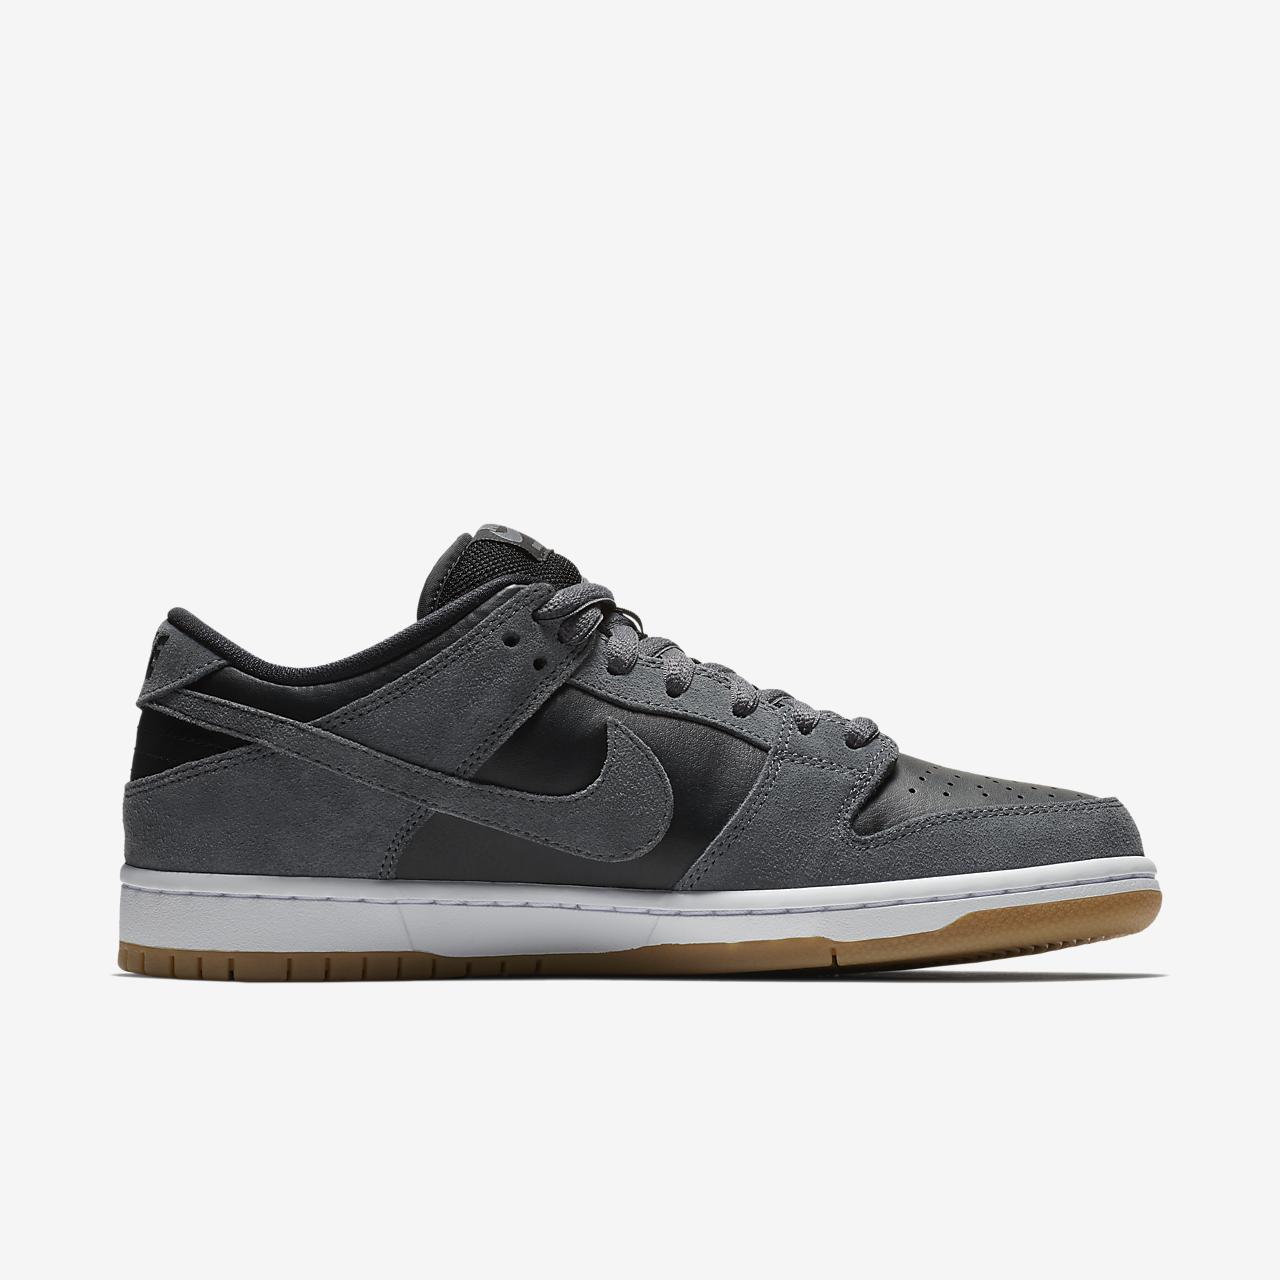 Nike SB Dunk Low Pro Men's Skateboarding Shoes Black/White/Grey xT3520V